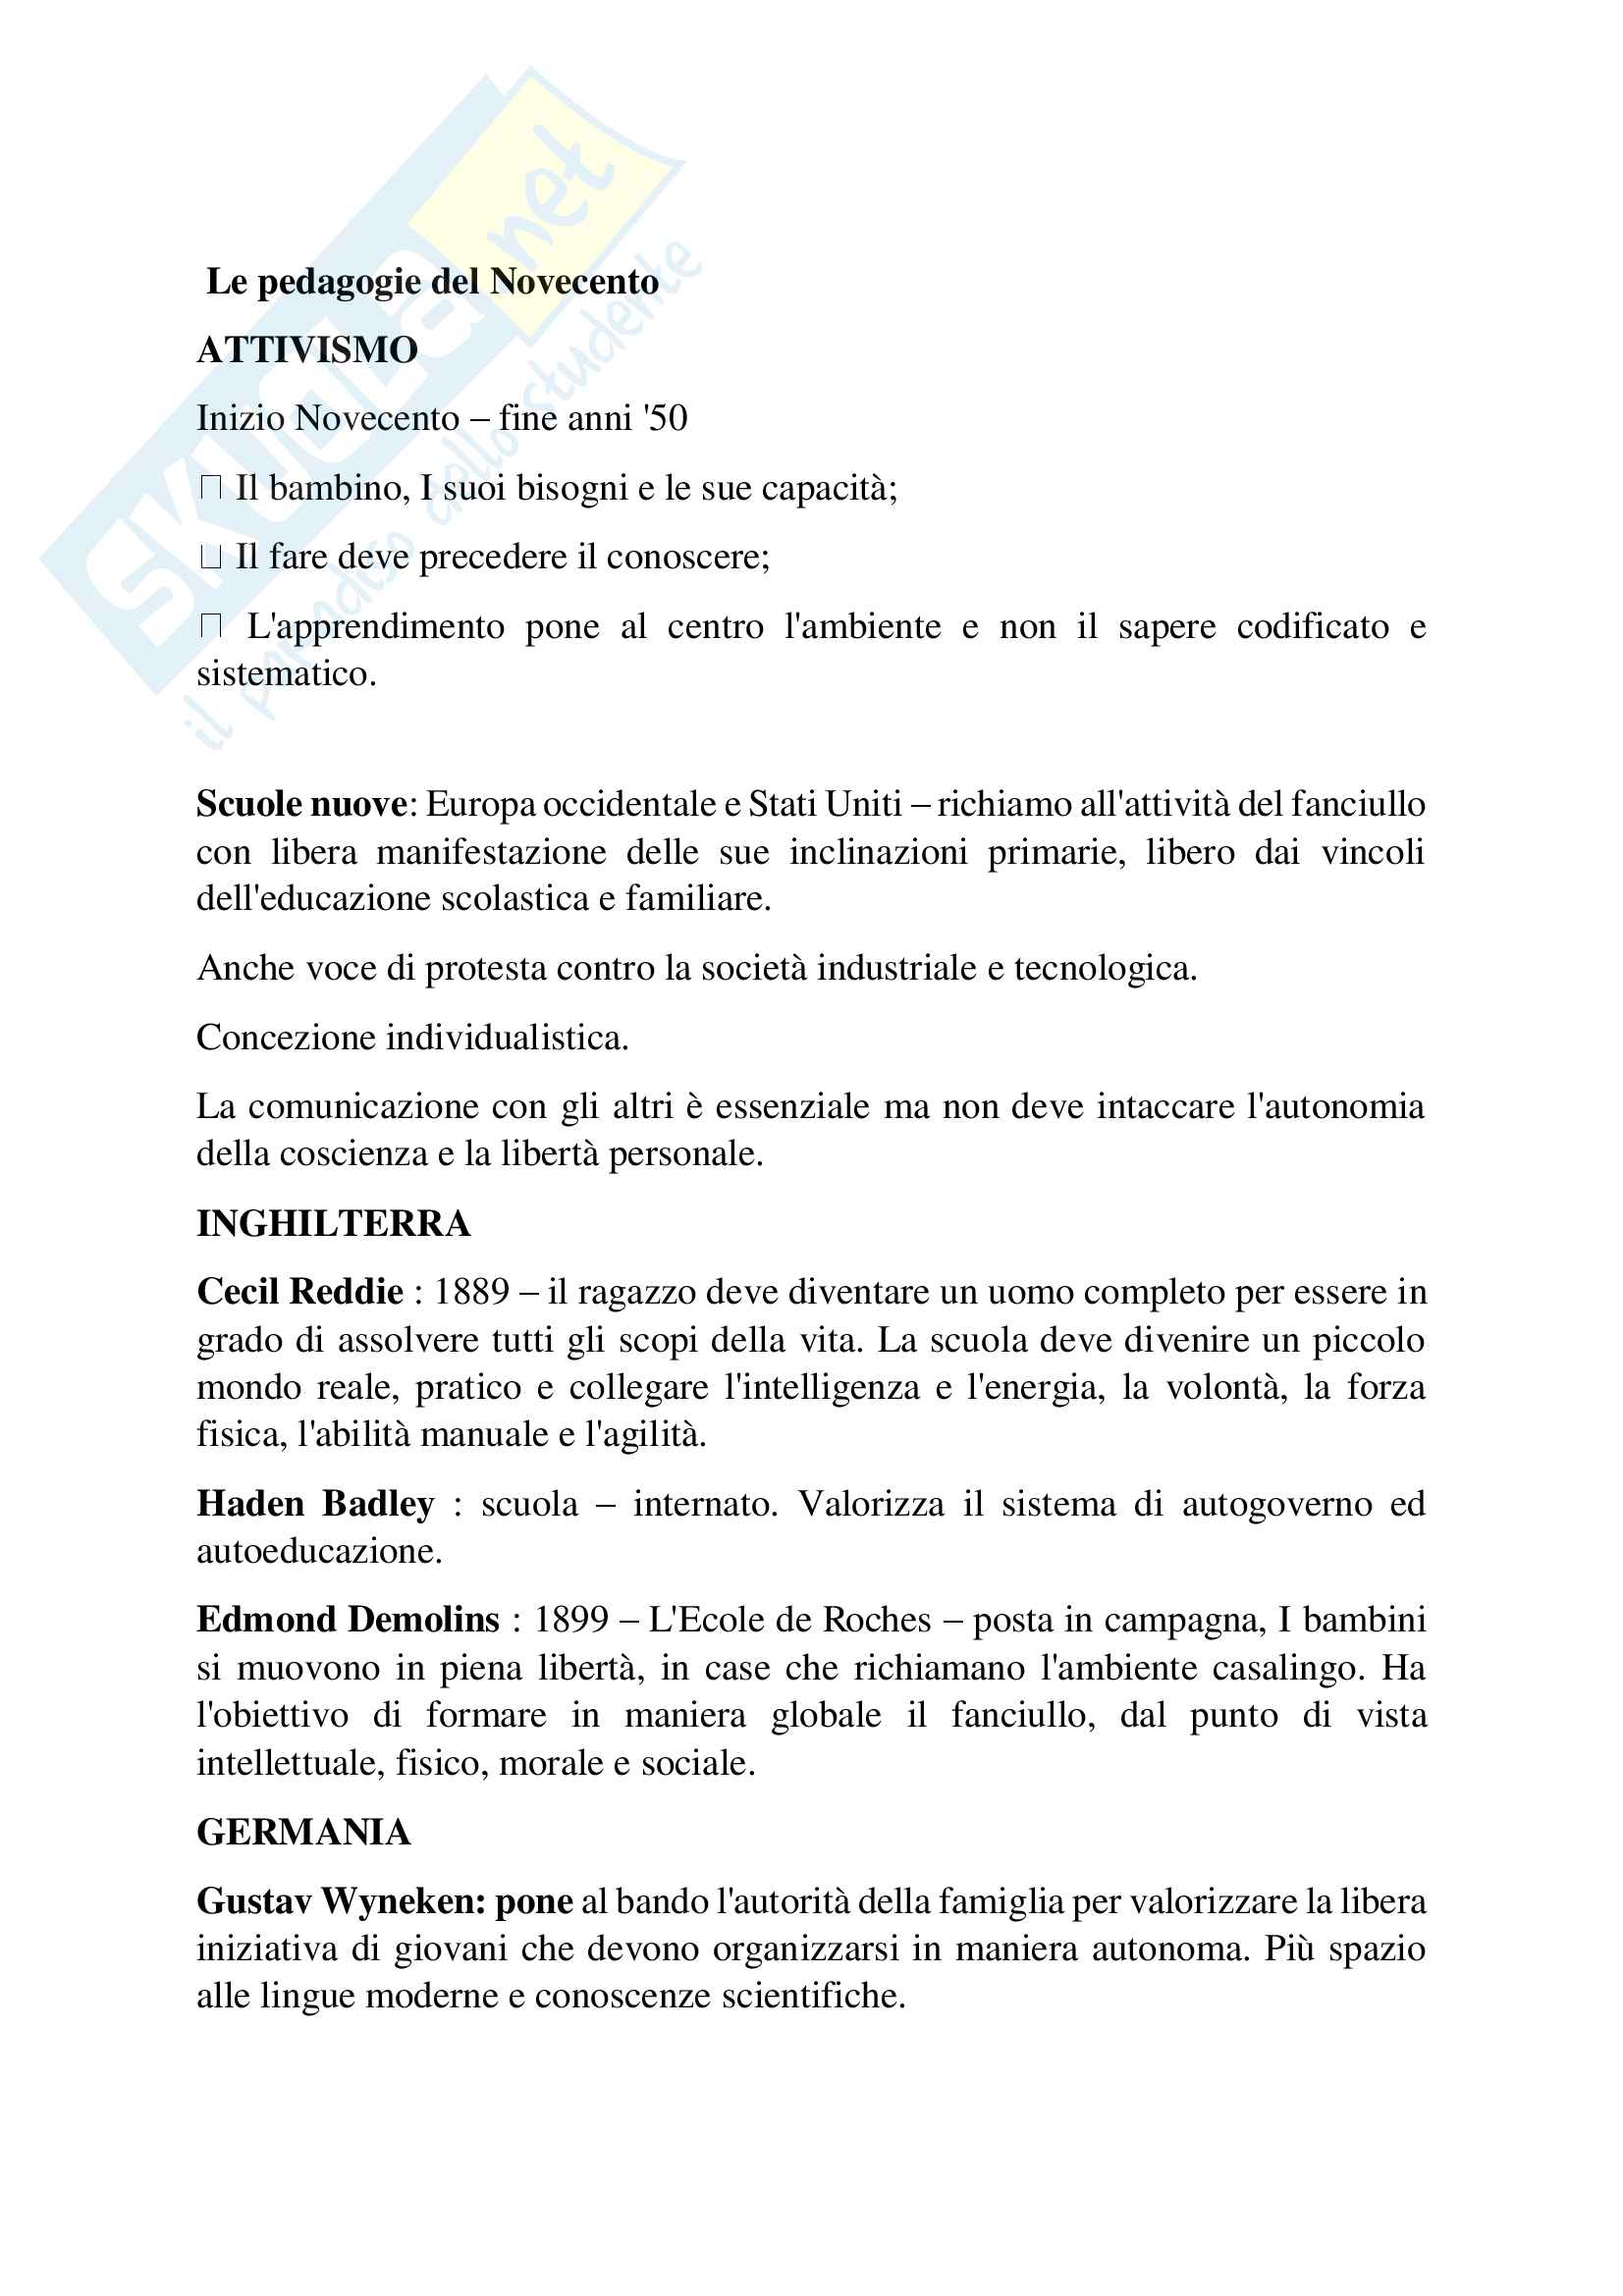 Riassunto esame Pedagogia generale, prof. D'Agnese Vasco, Libro consigliato Le pedagogie del Novecento, Cambi F